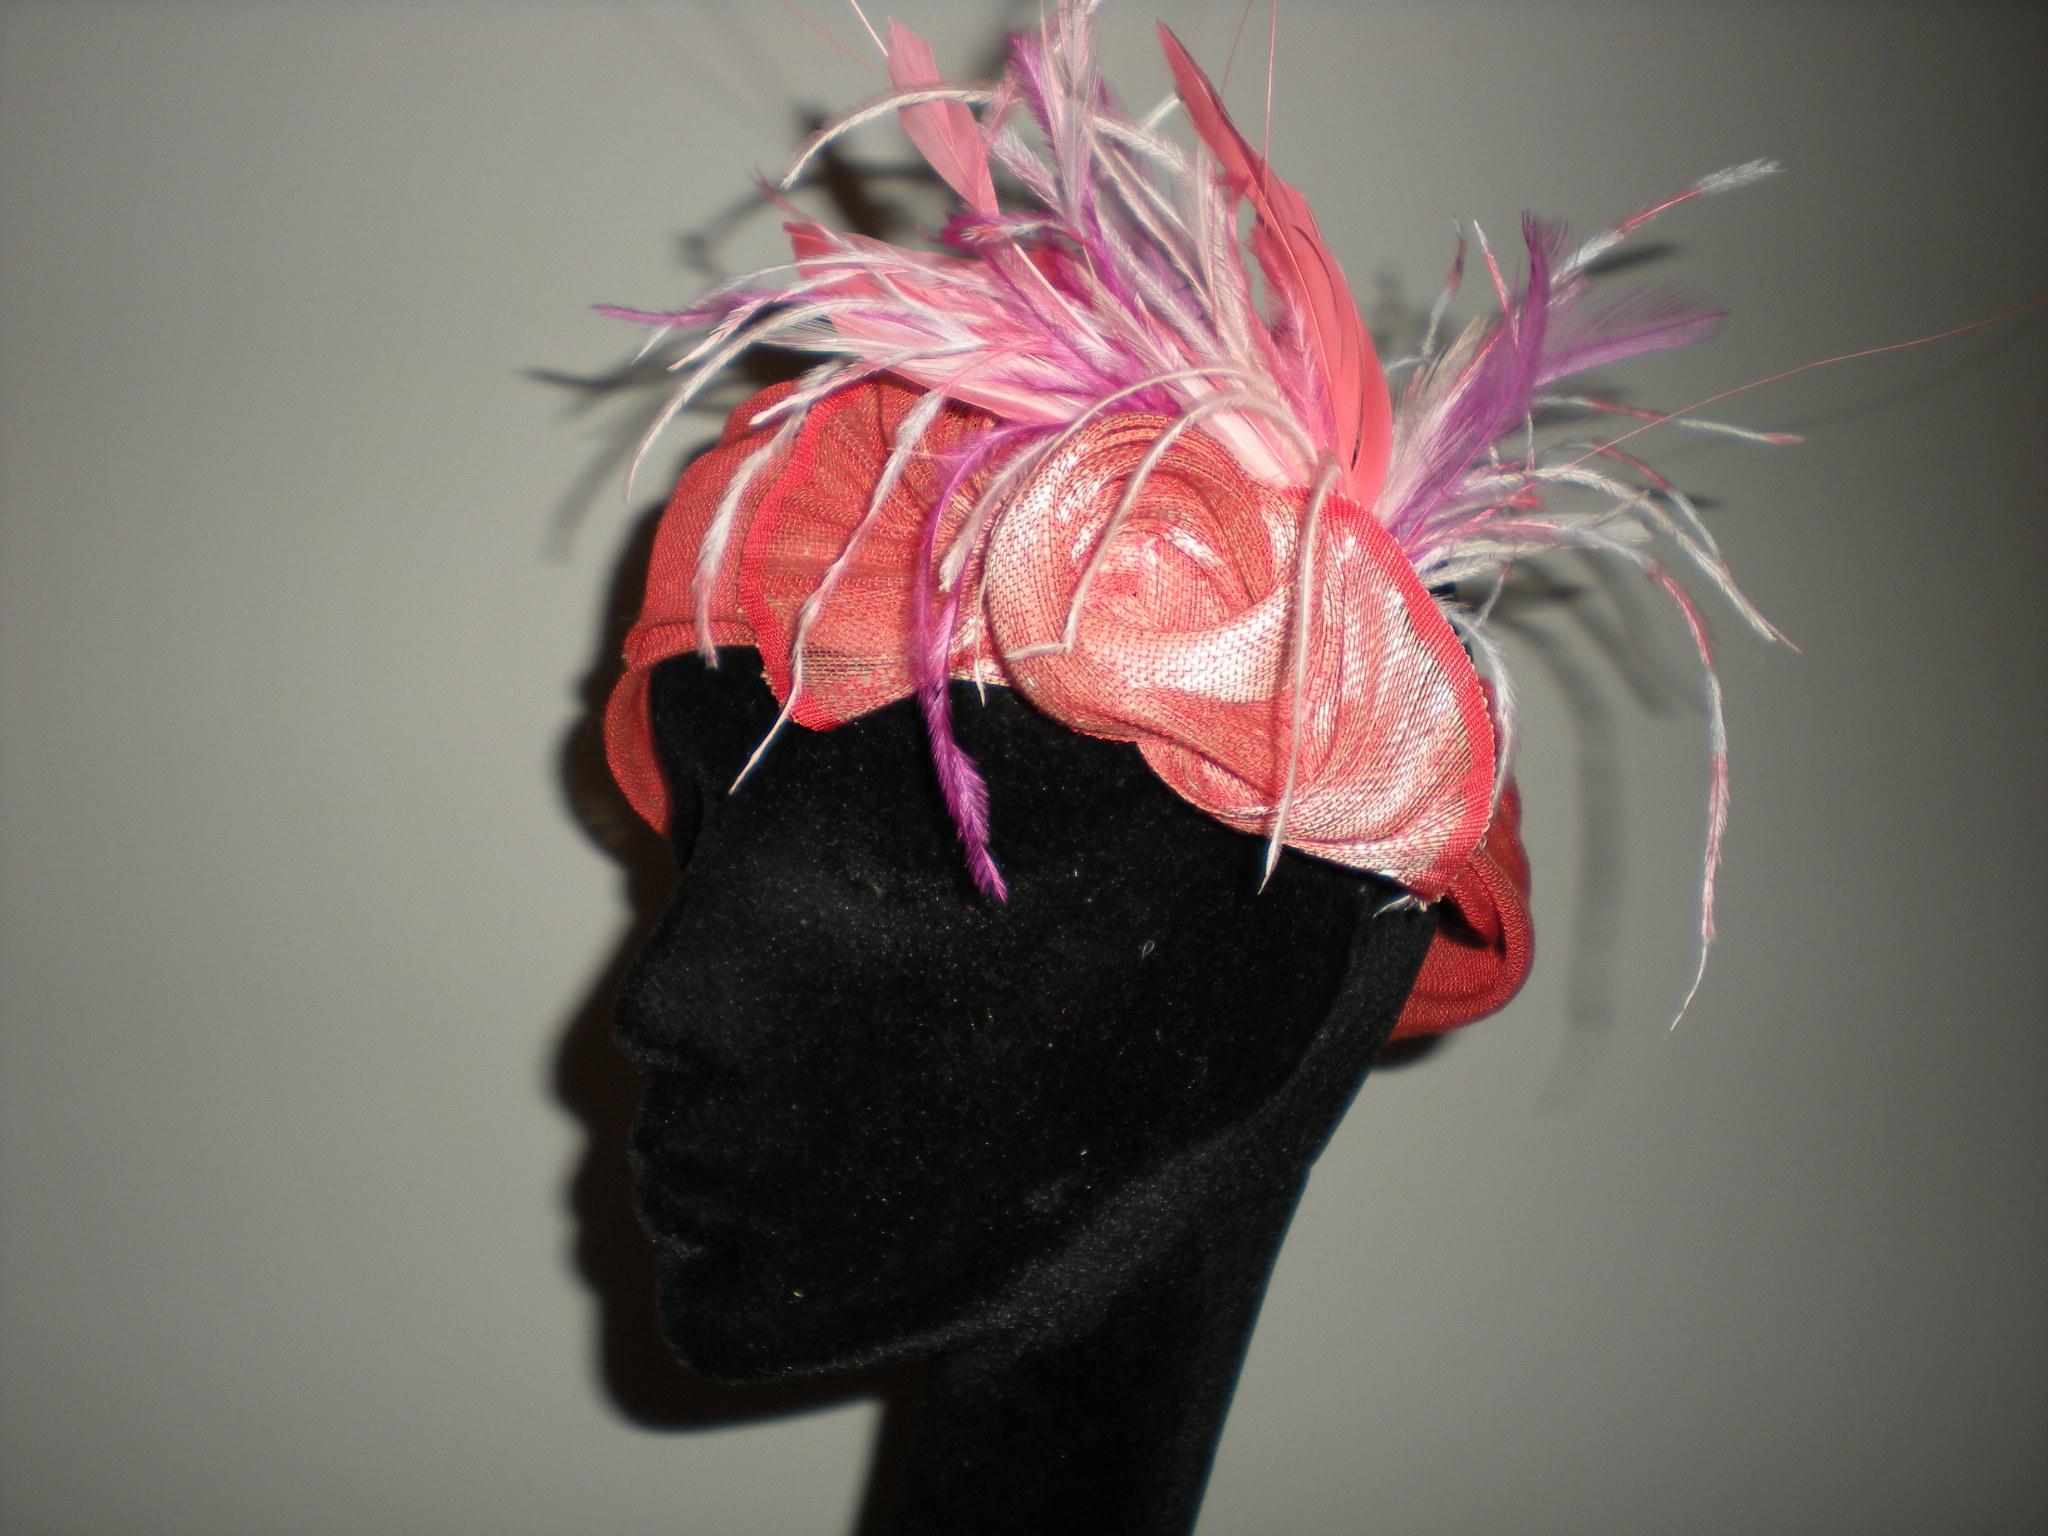 Banda turbante agurital